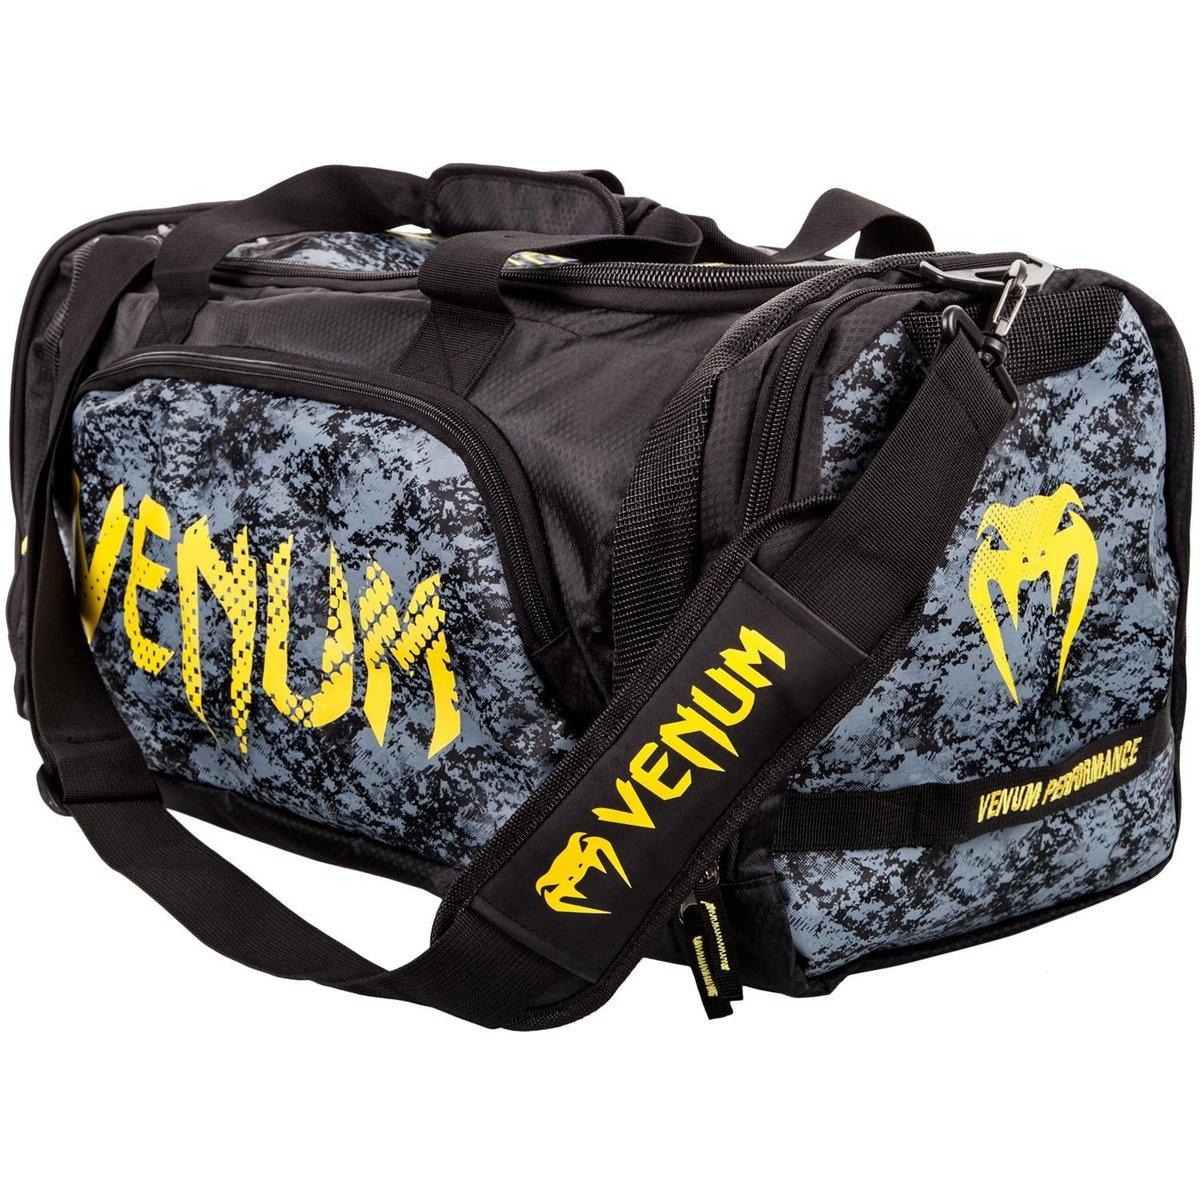 taška VENUM - Tramo Sport - Black/Yellow - VENUM-02910-111